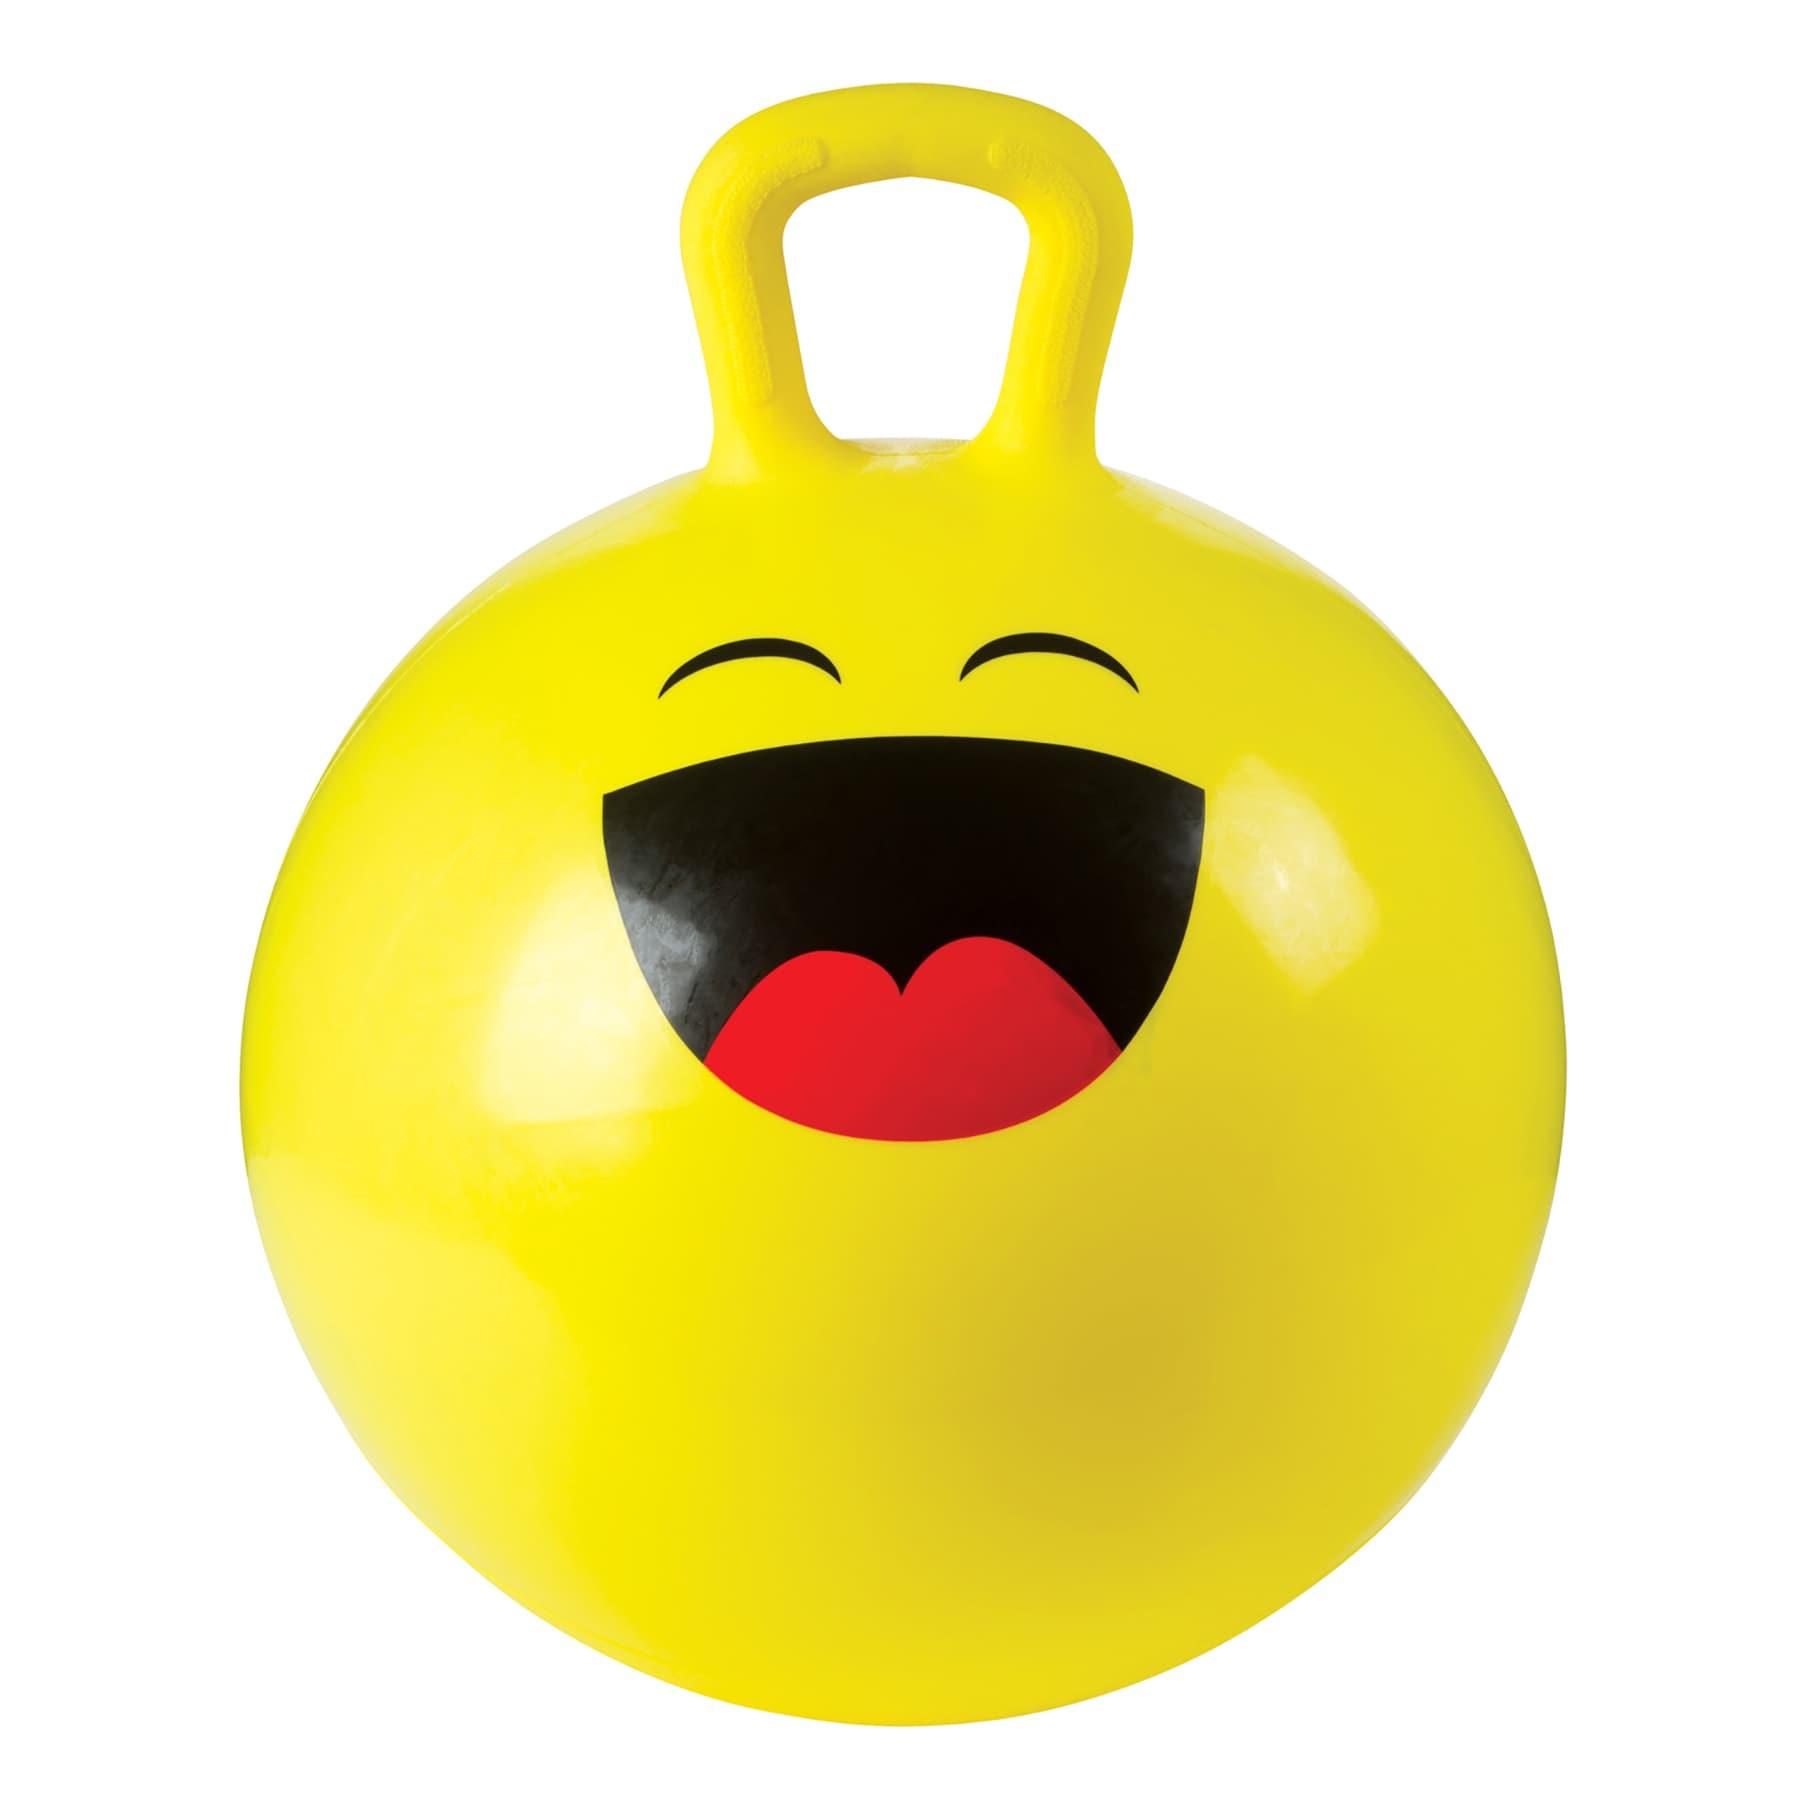 Toysmith 18In Emoji Hoppy Ball With Pump (Assorted Styles...